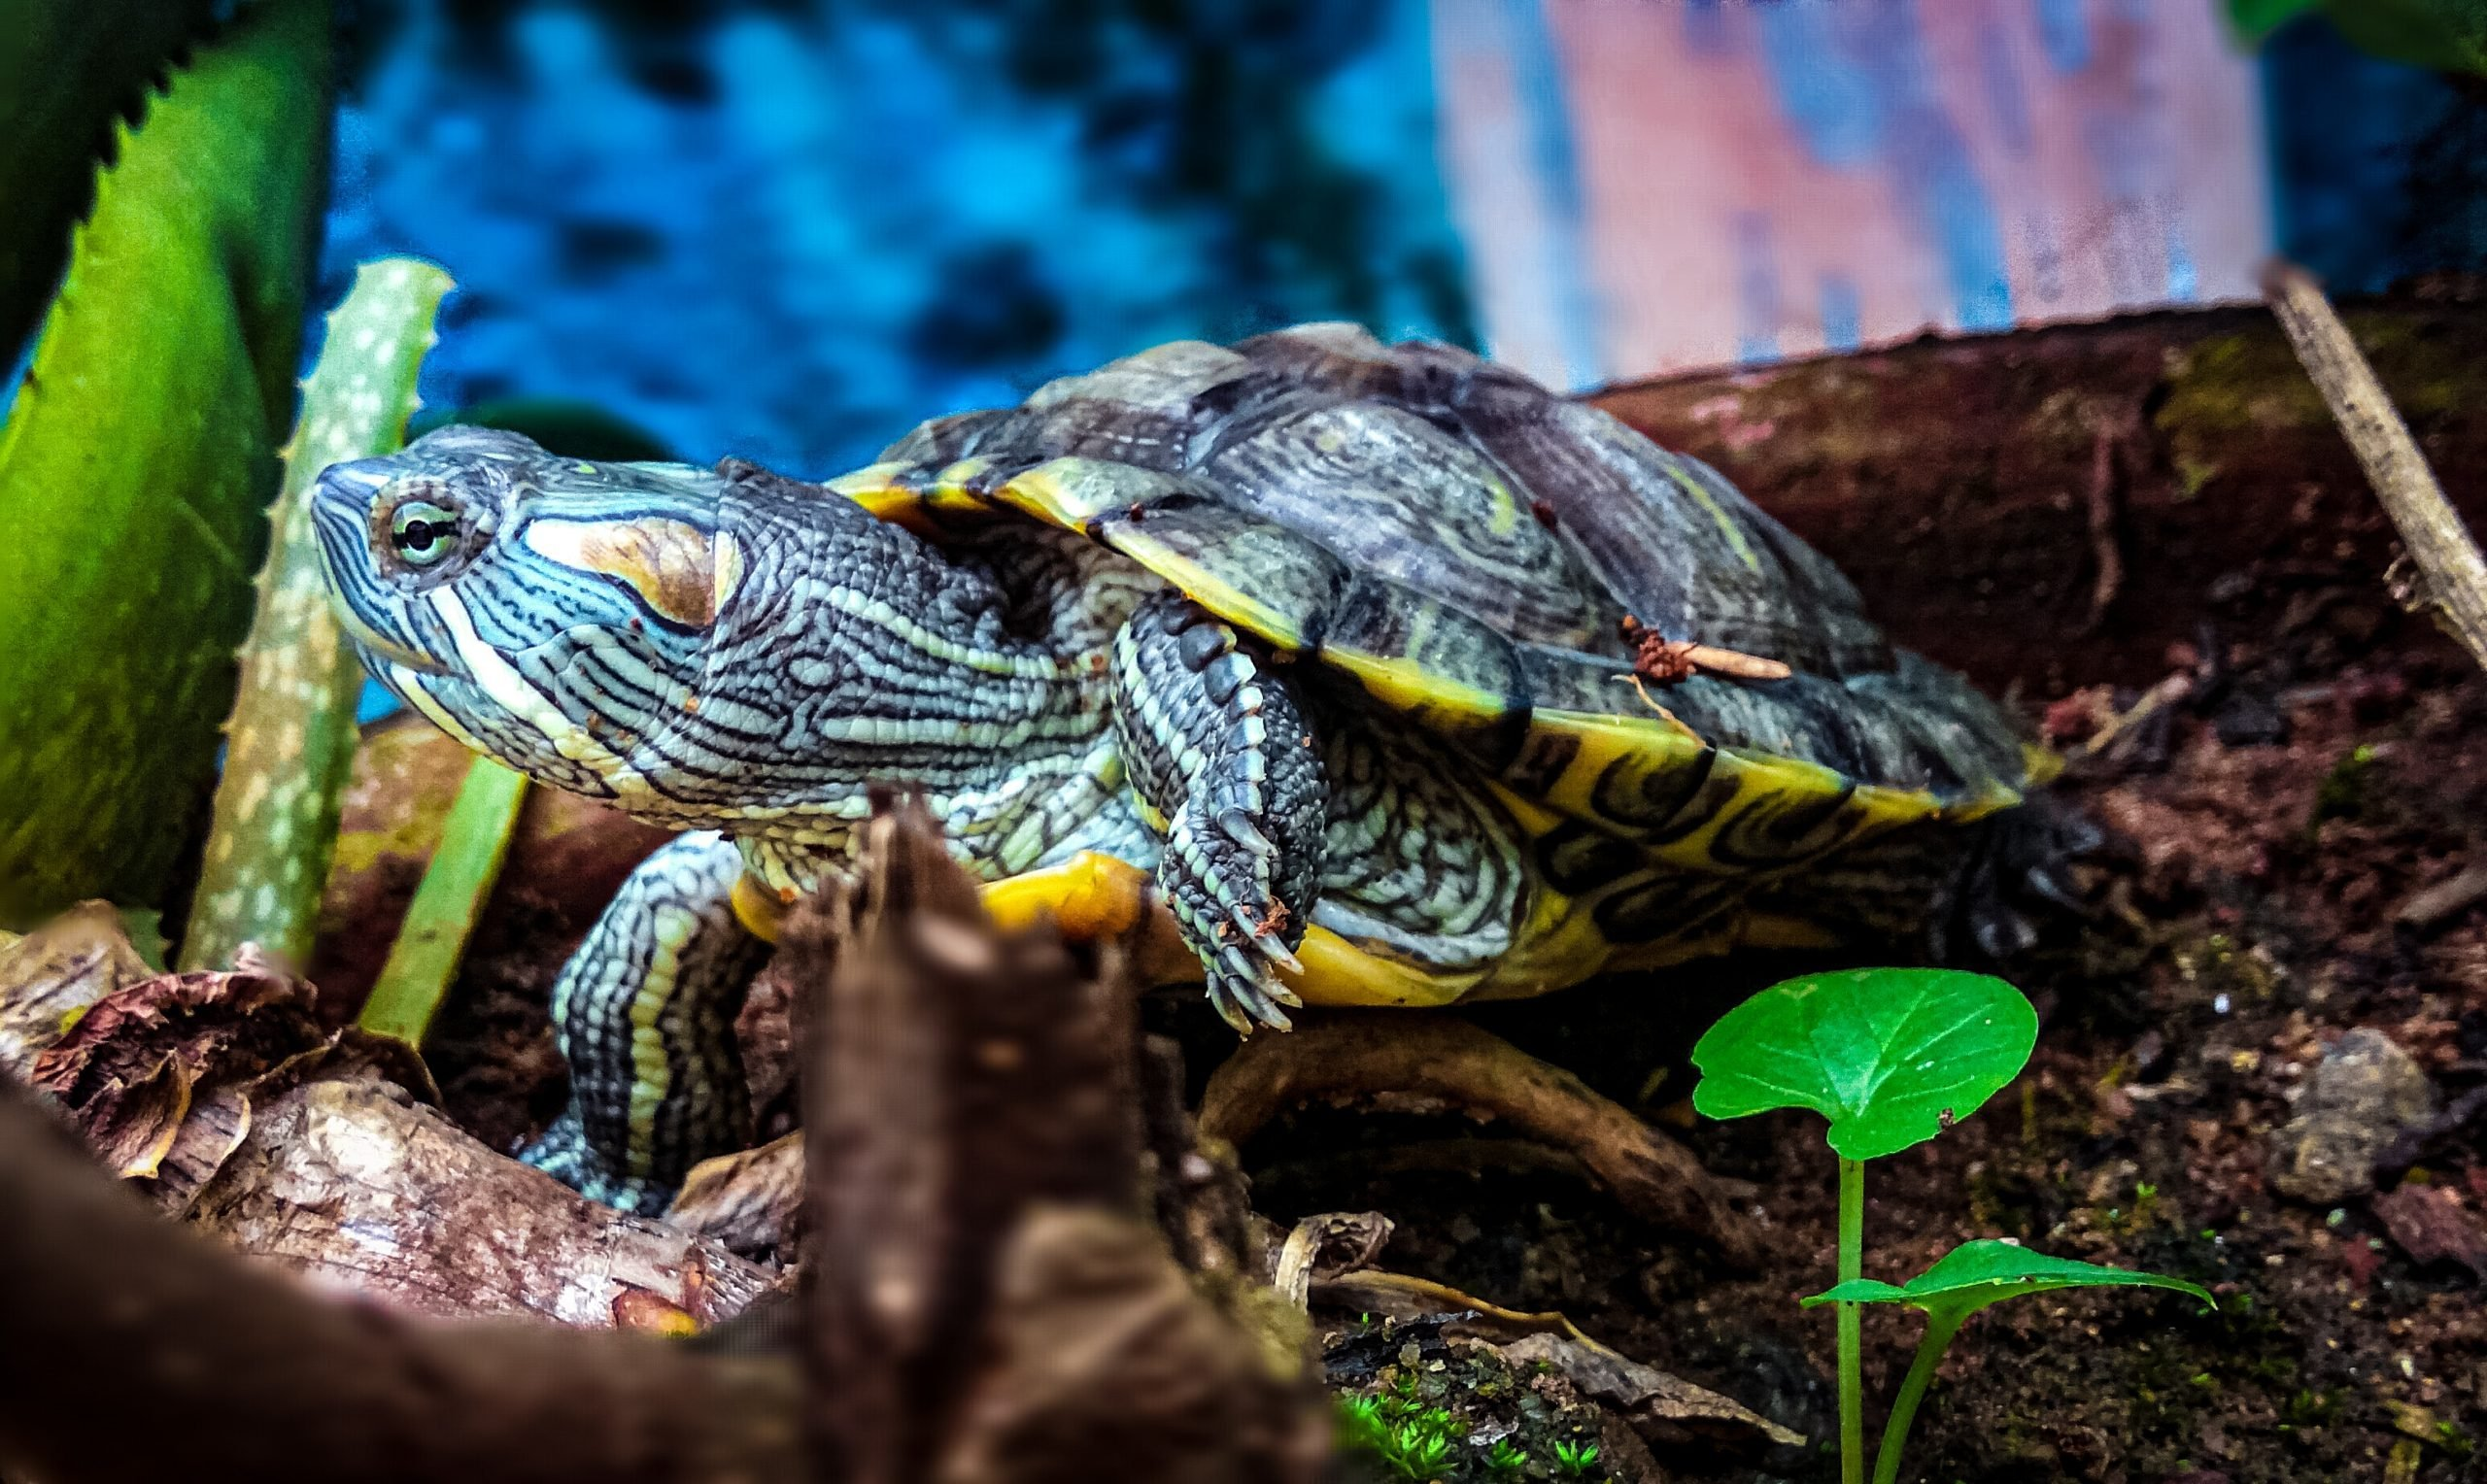 Textured Turtle